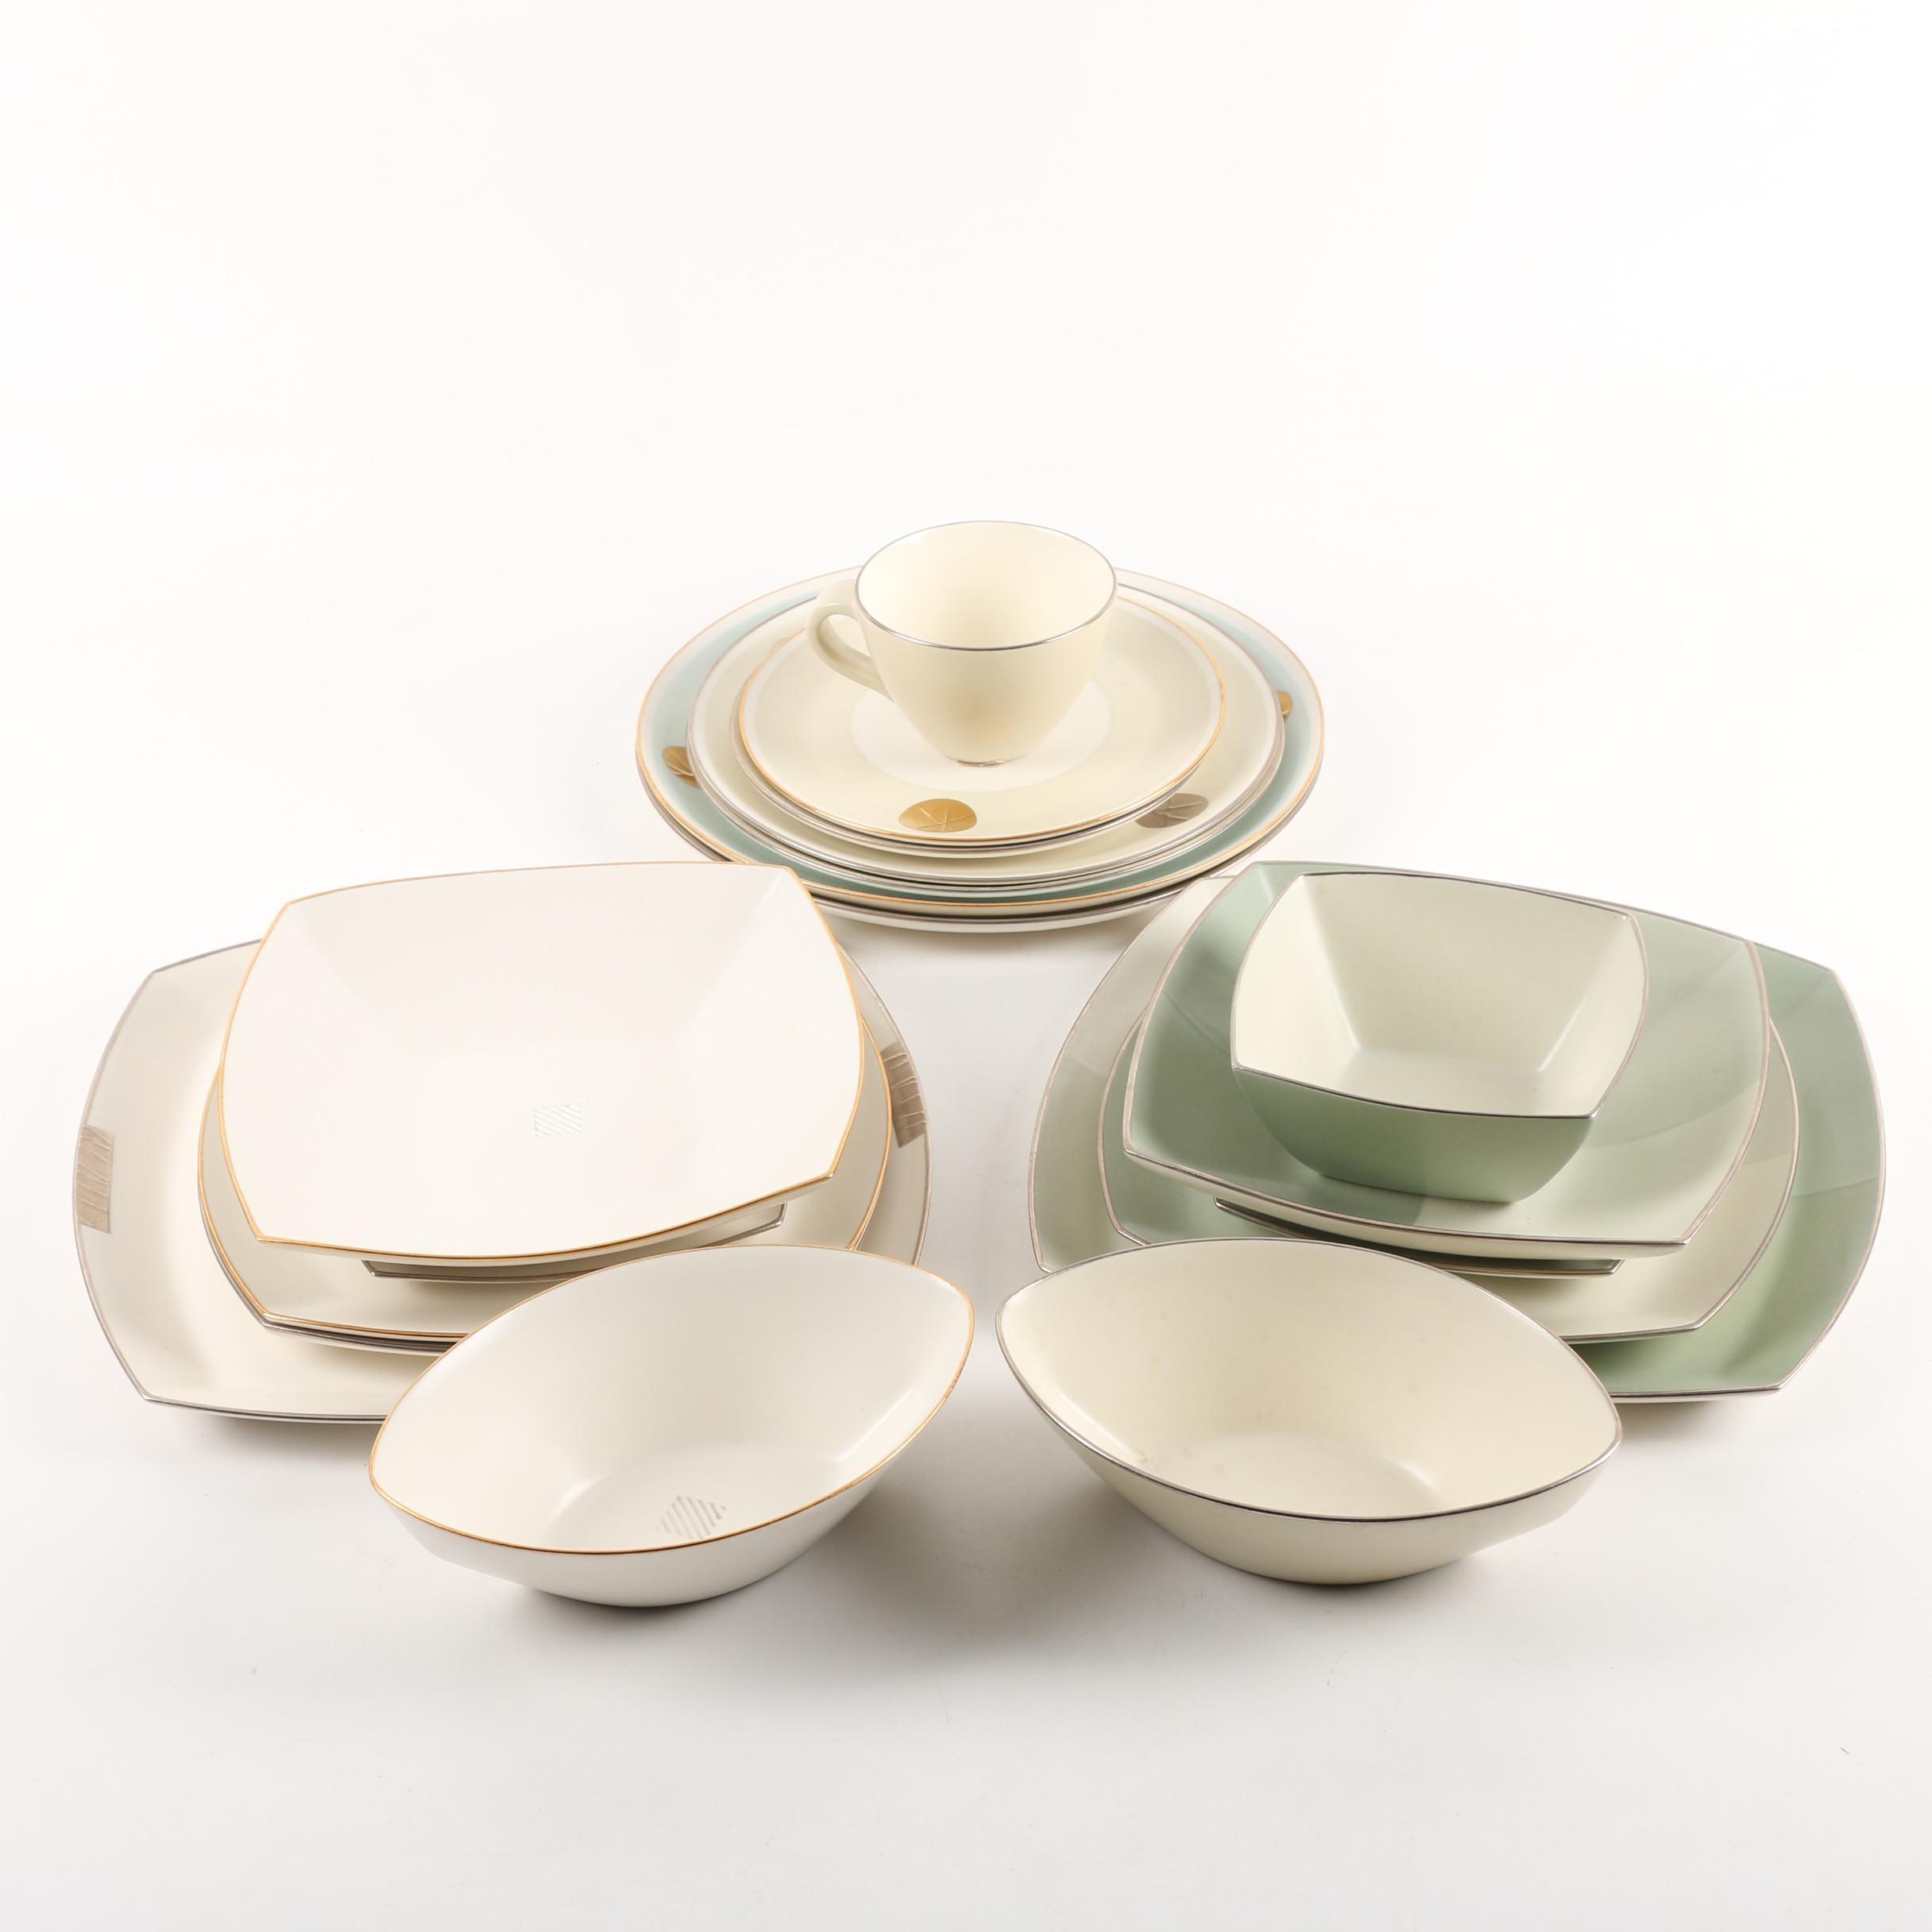 Contemporary Daniel Levy Hand Built Signed Porcelain Dinnerware